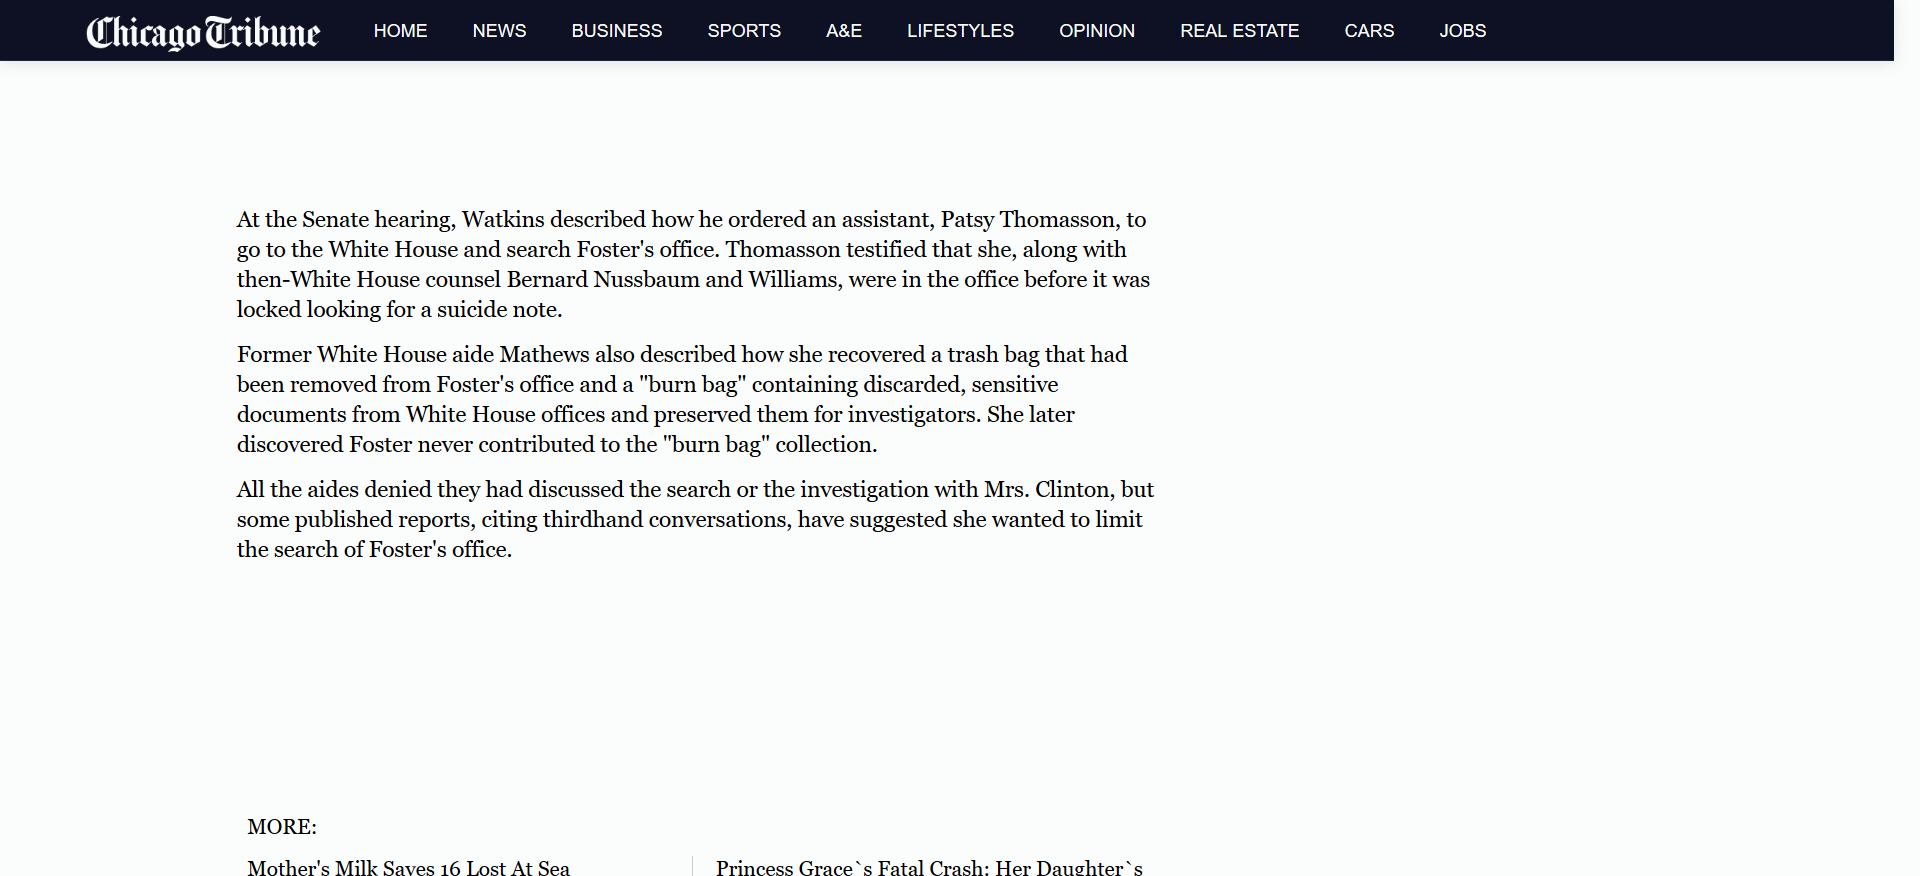 Mathews retrieved burn bag of Whitewater documents Chicago Tribune.png